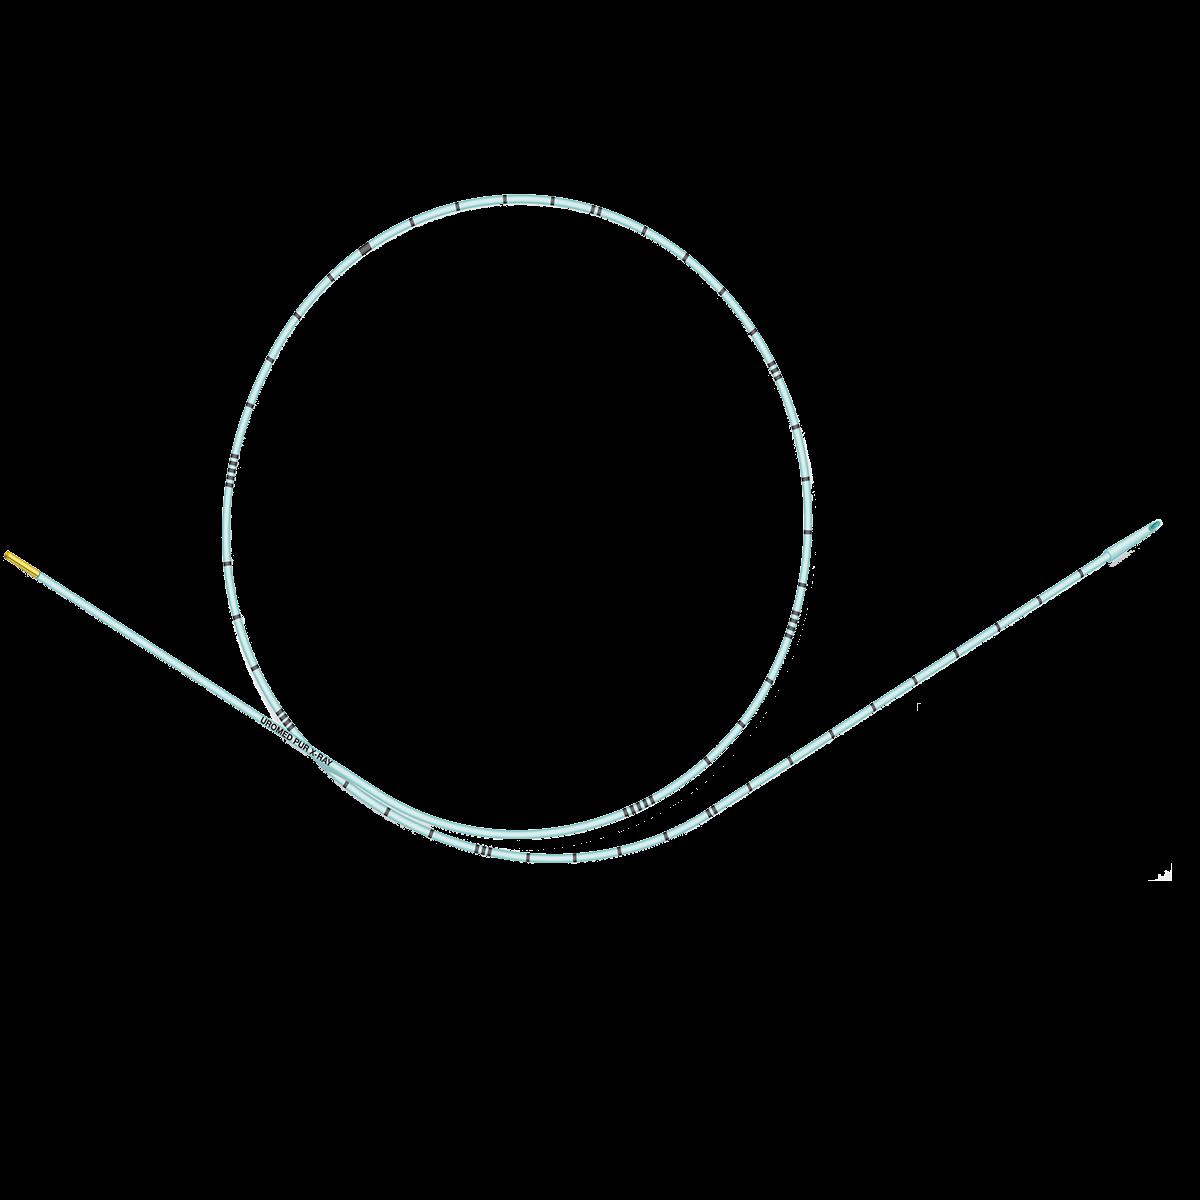 Ureteral catheter